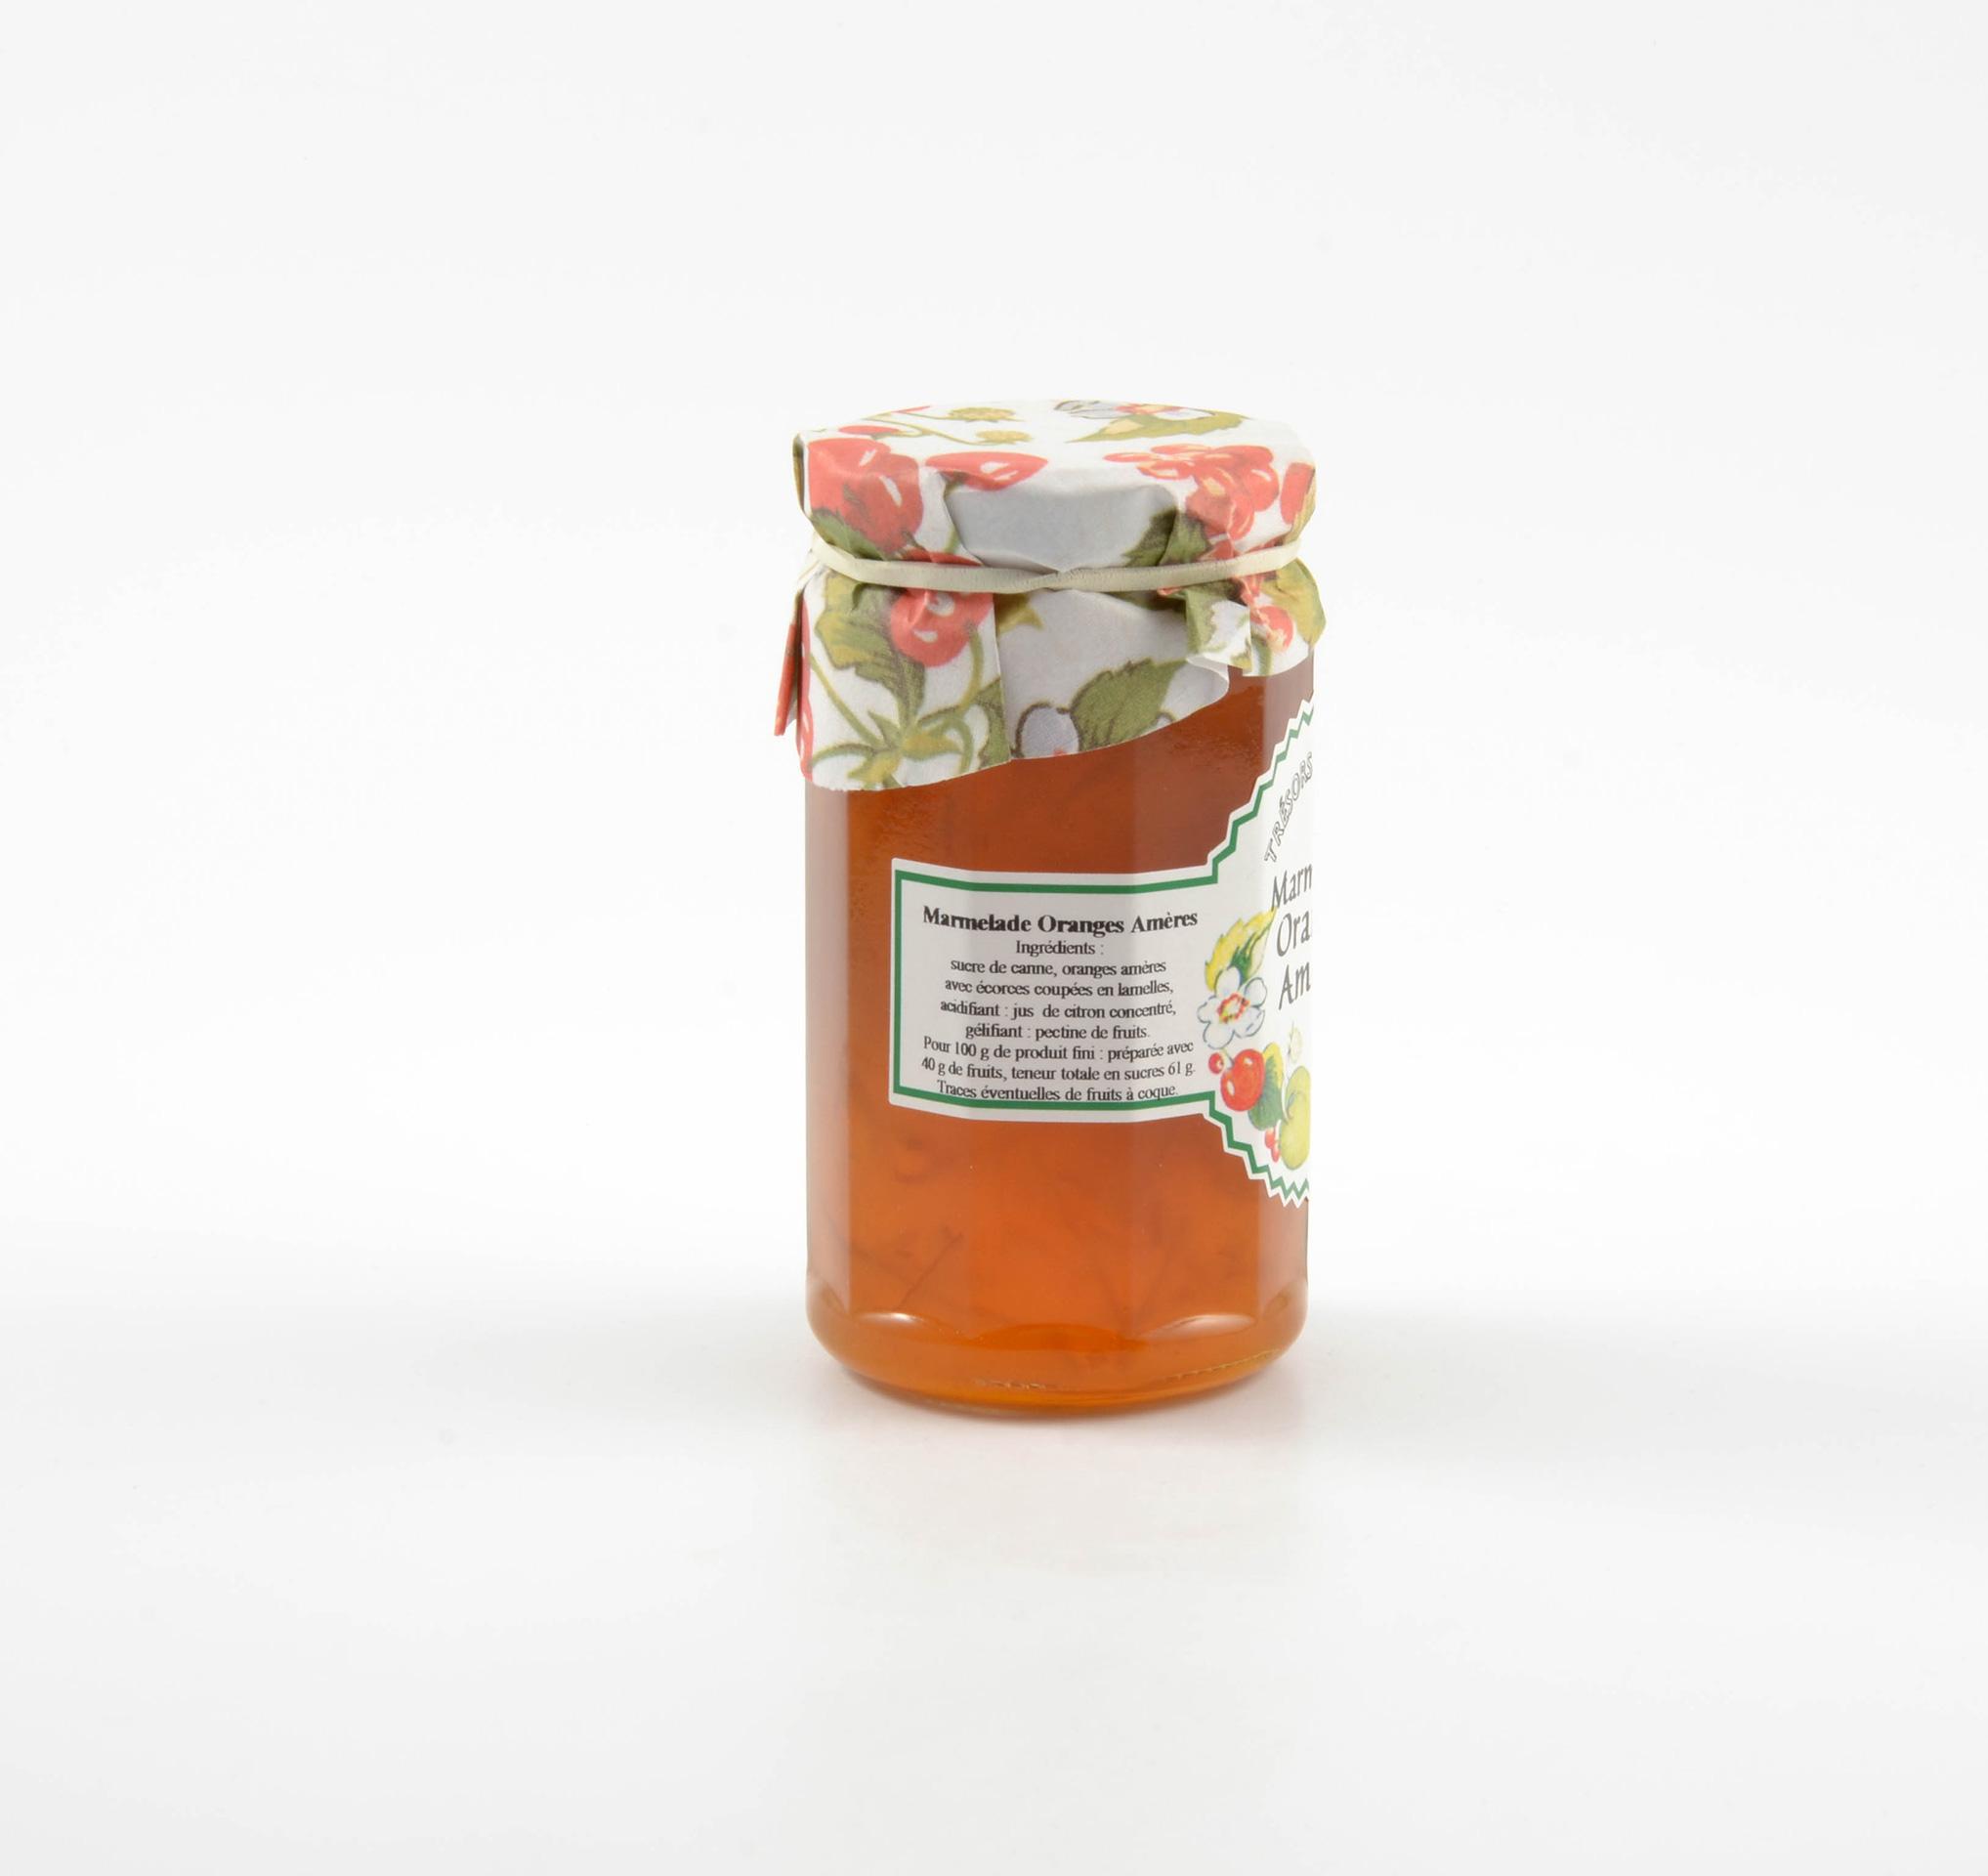 Marmelade d 39 orange am re maison lemaitre - Marmelade d orange amere ...